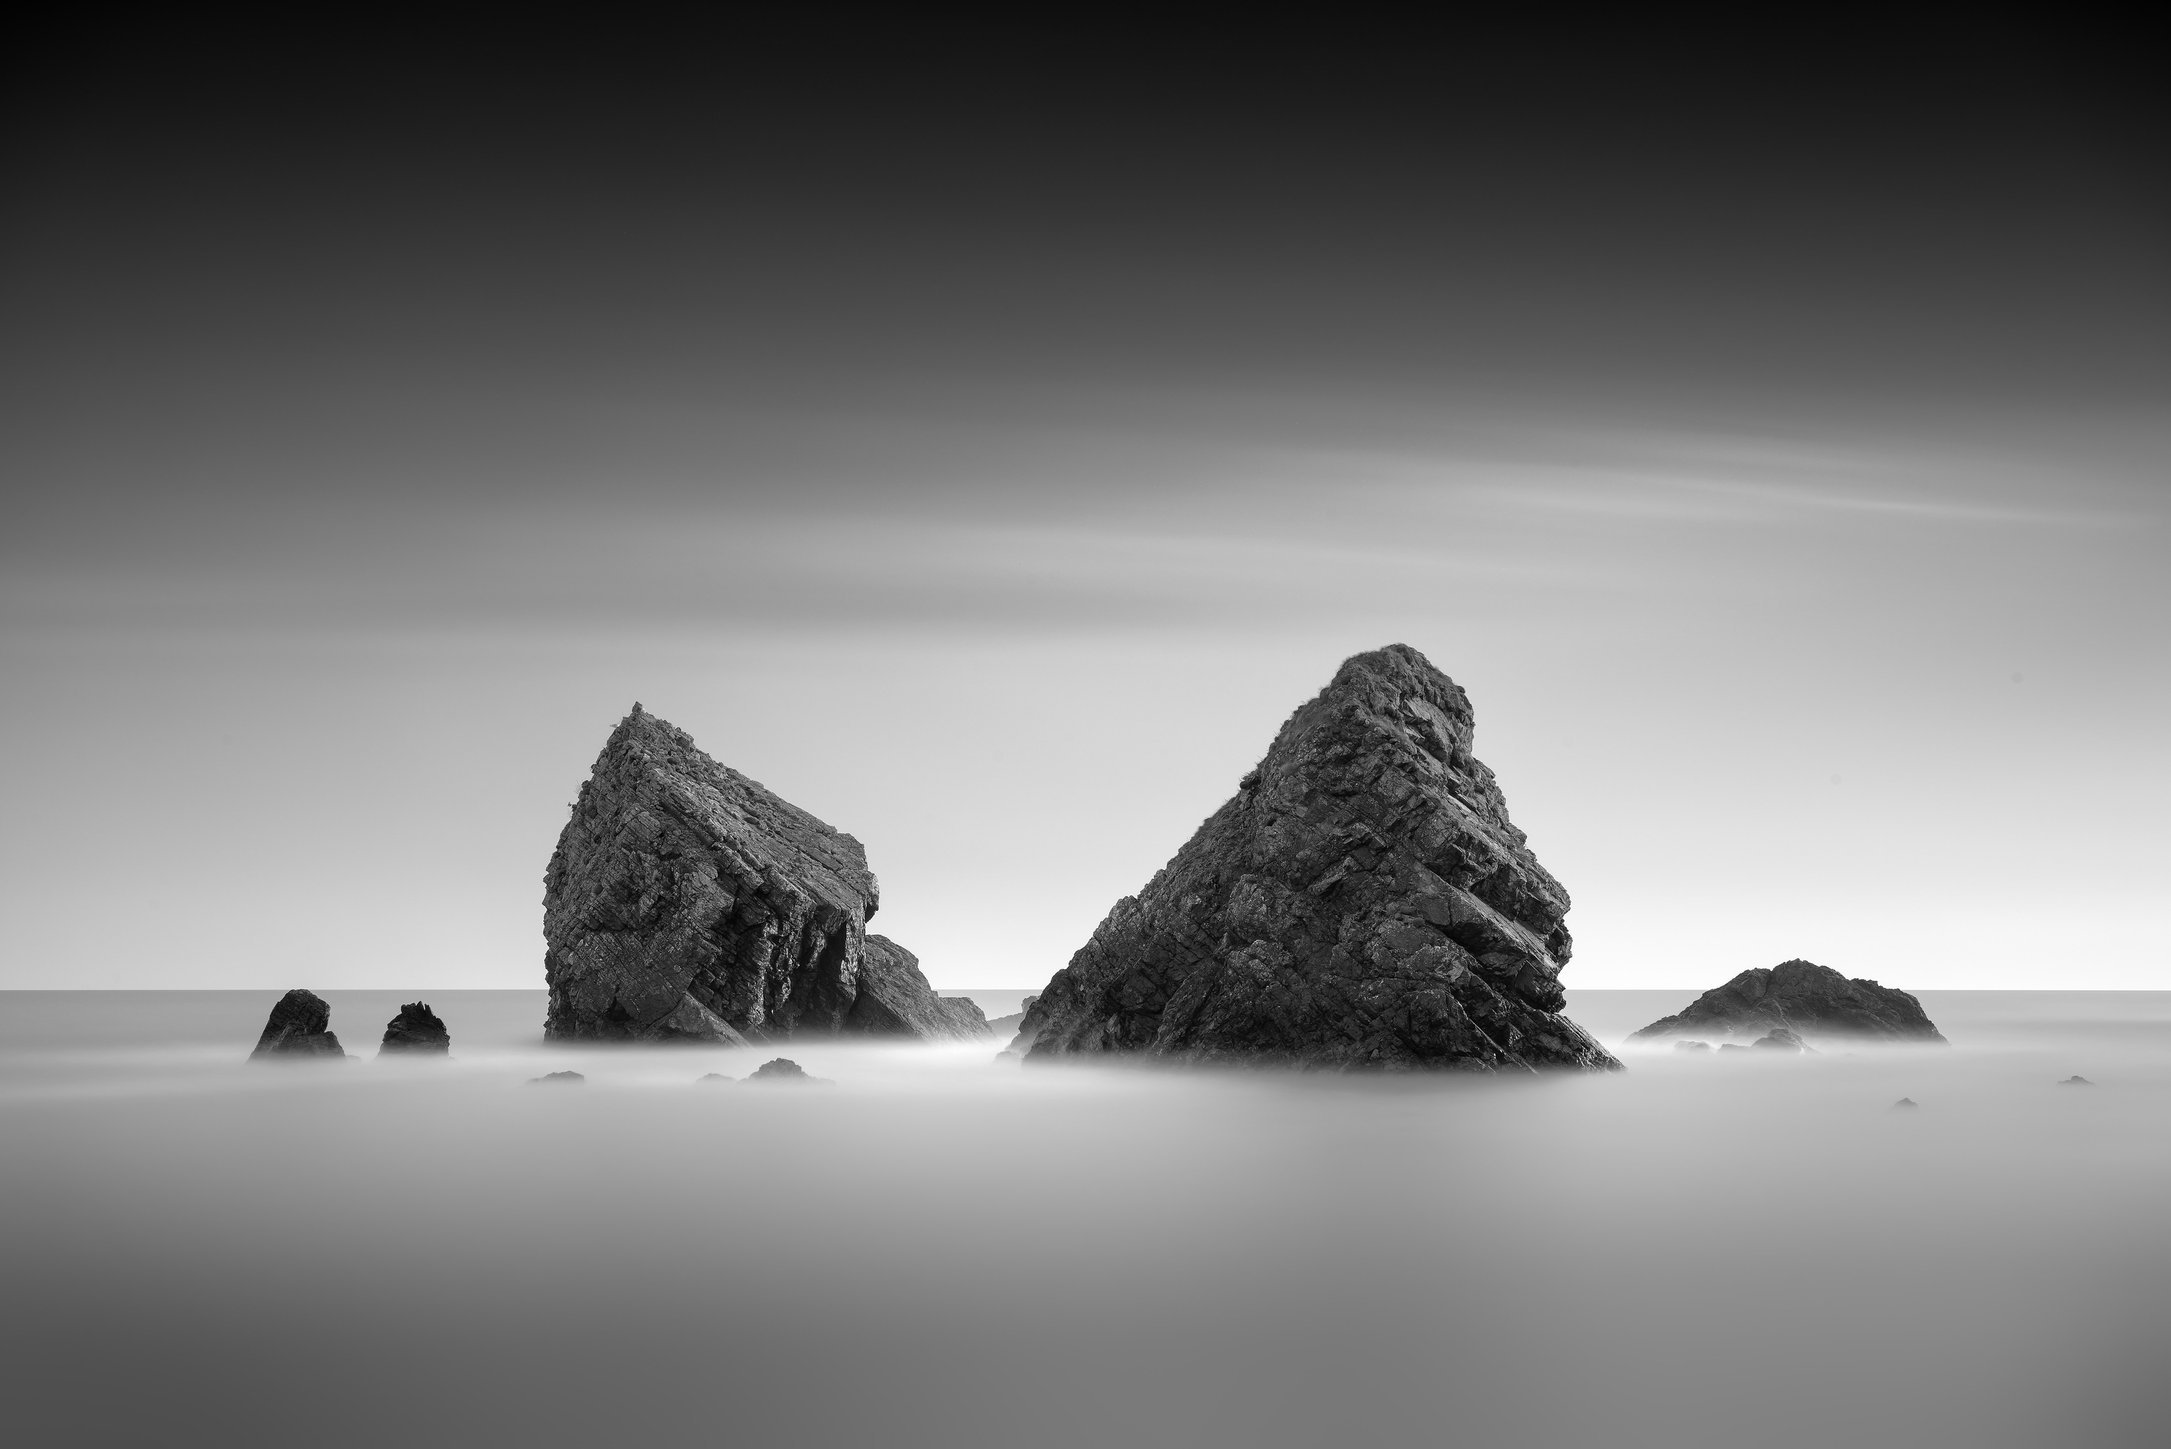 Sea Stacks, Ballydowane, Copper Coast